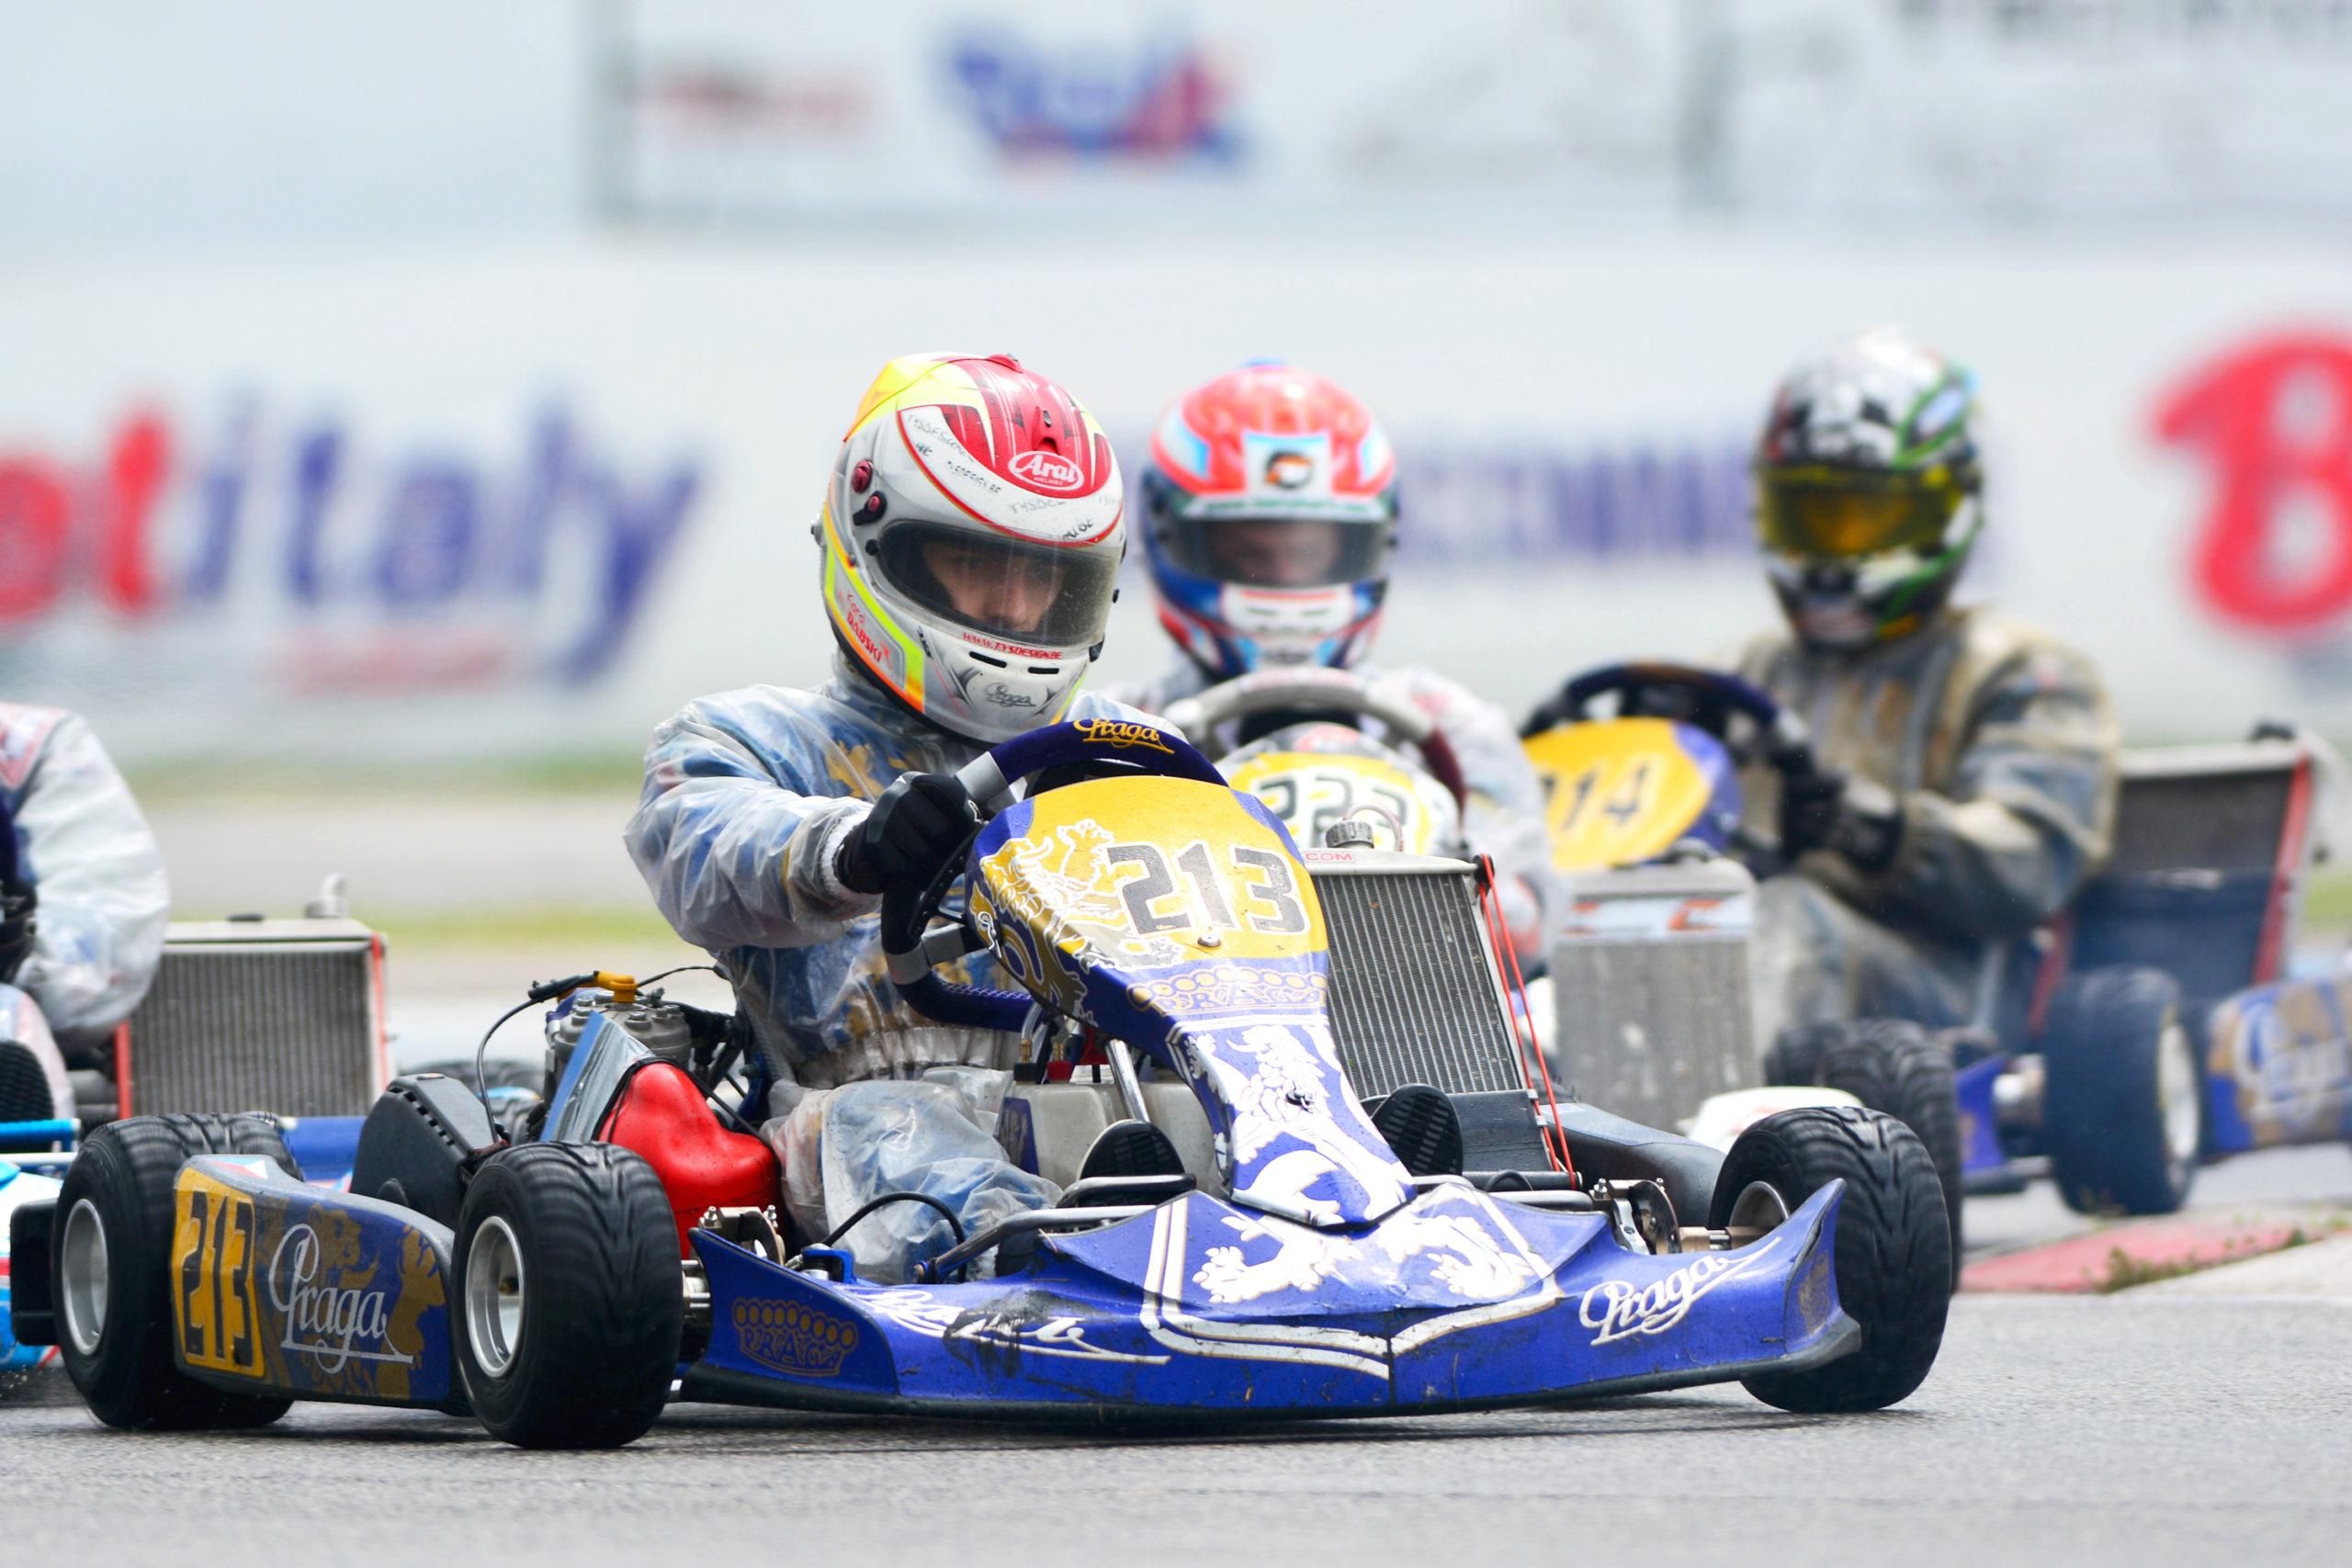 Praga Kart Racing almost at a podium